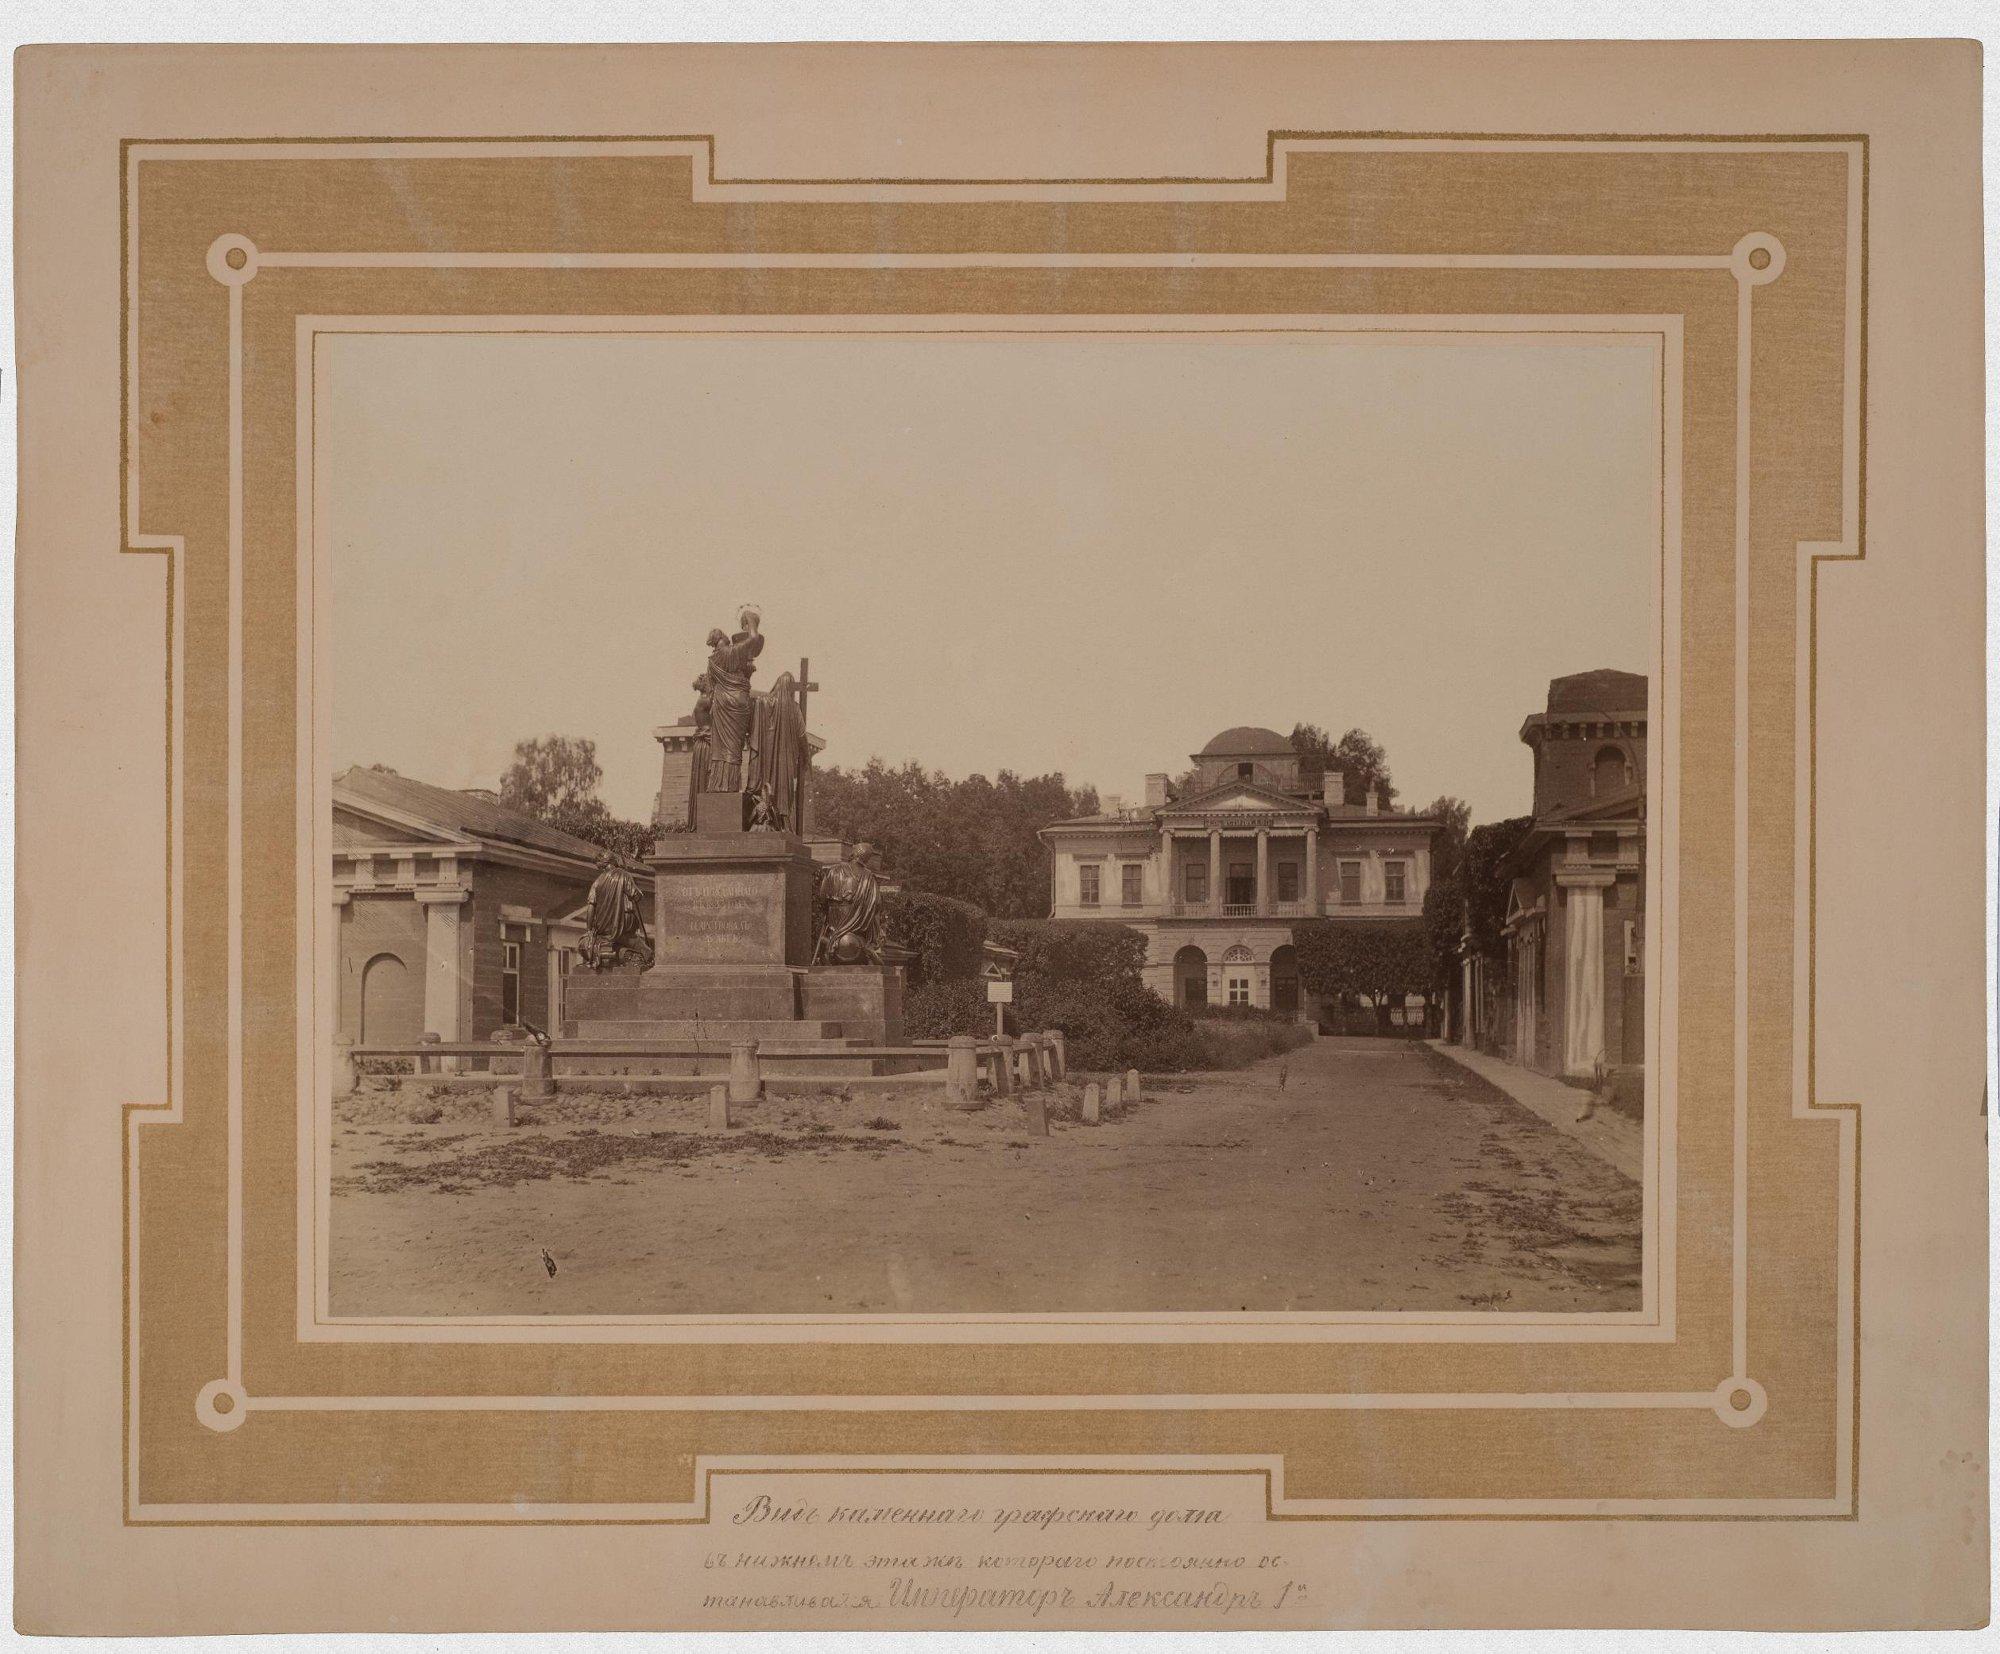 1880-е. Вид графского дома и памятника Александру I в Грузине